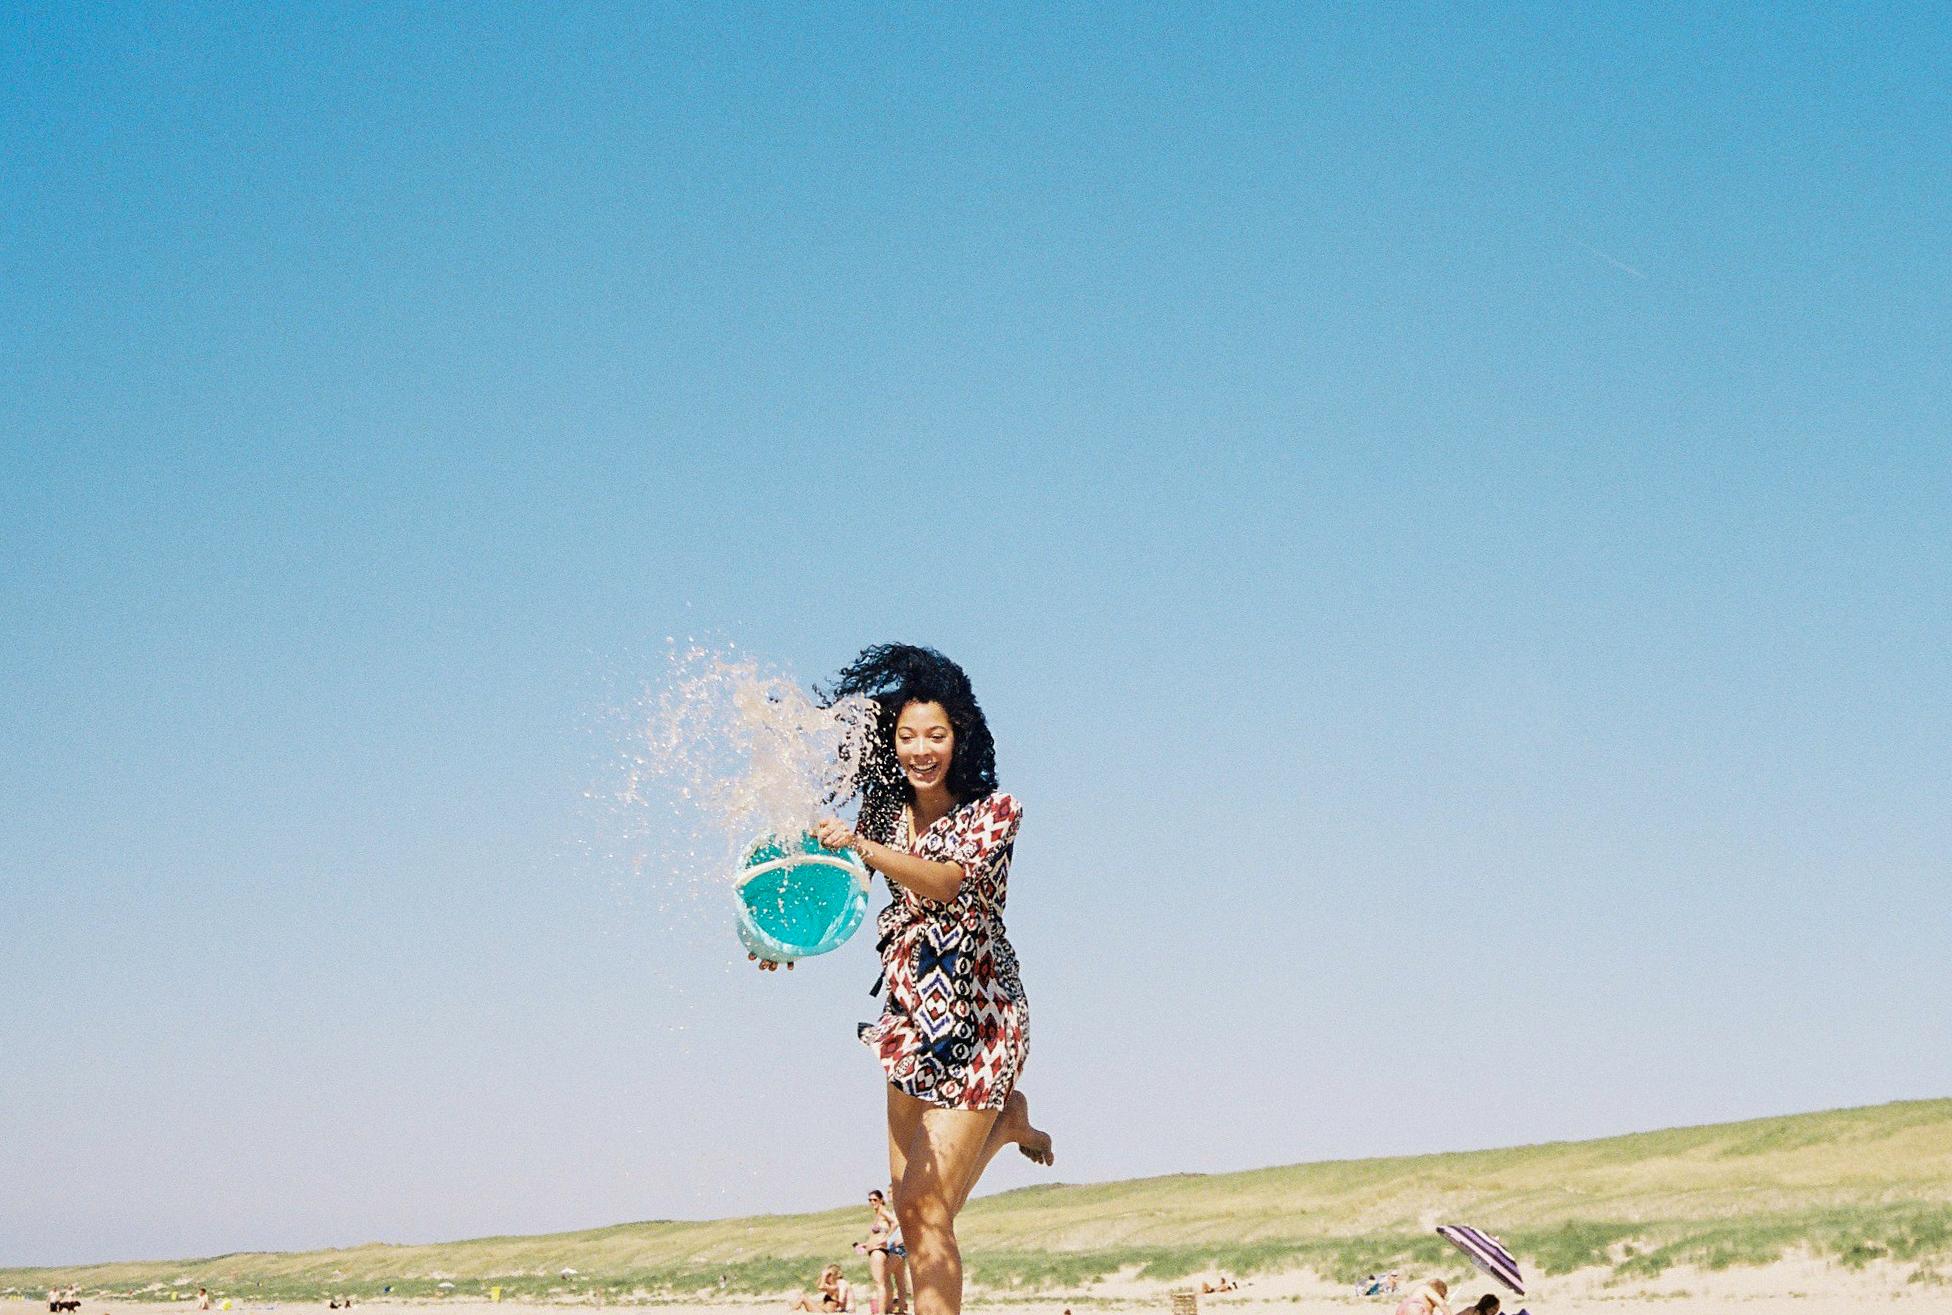 Girl throwing bucket of water